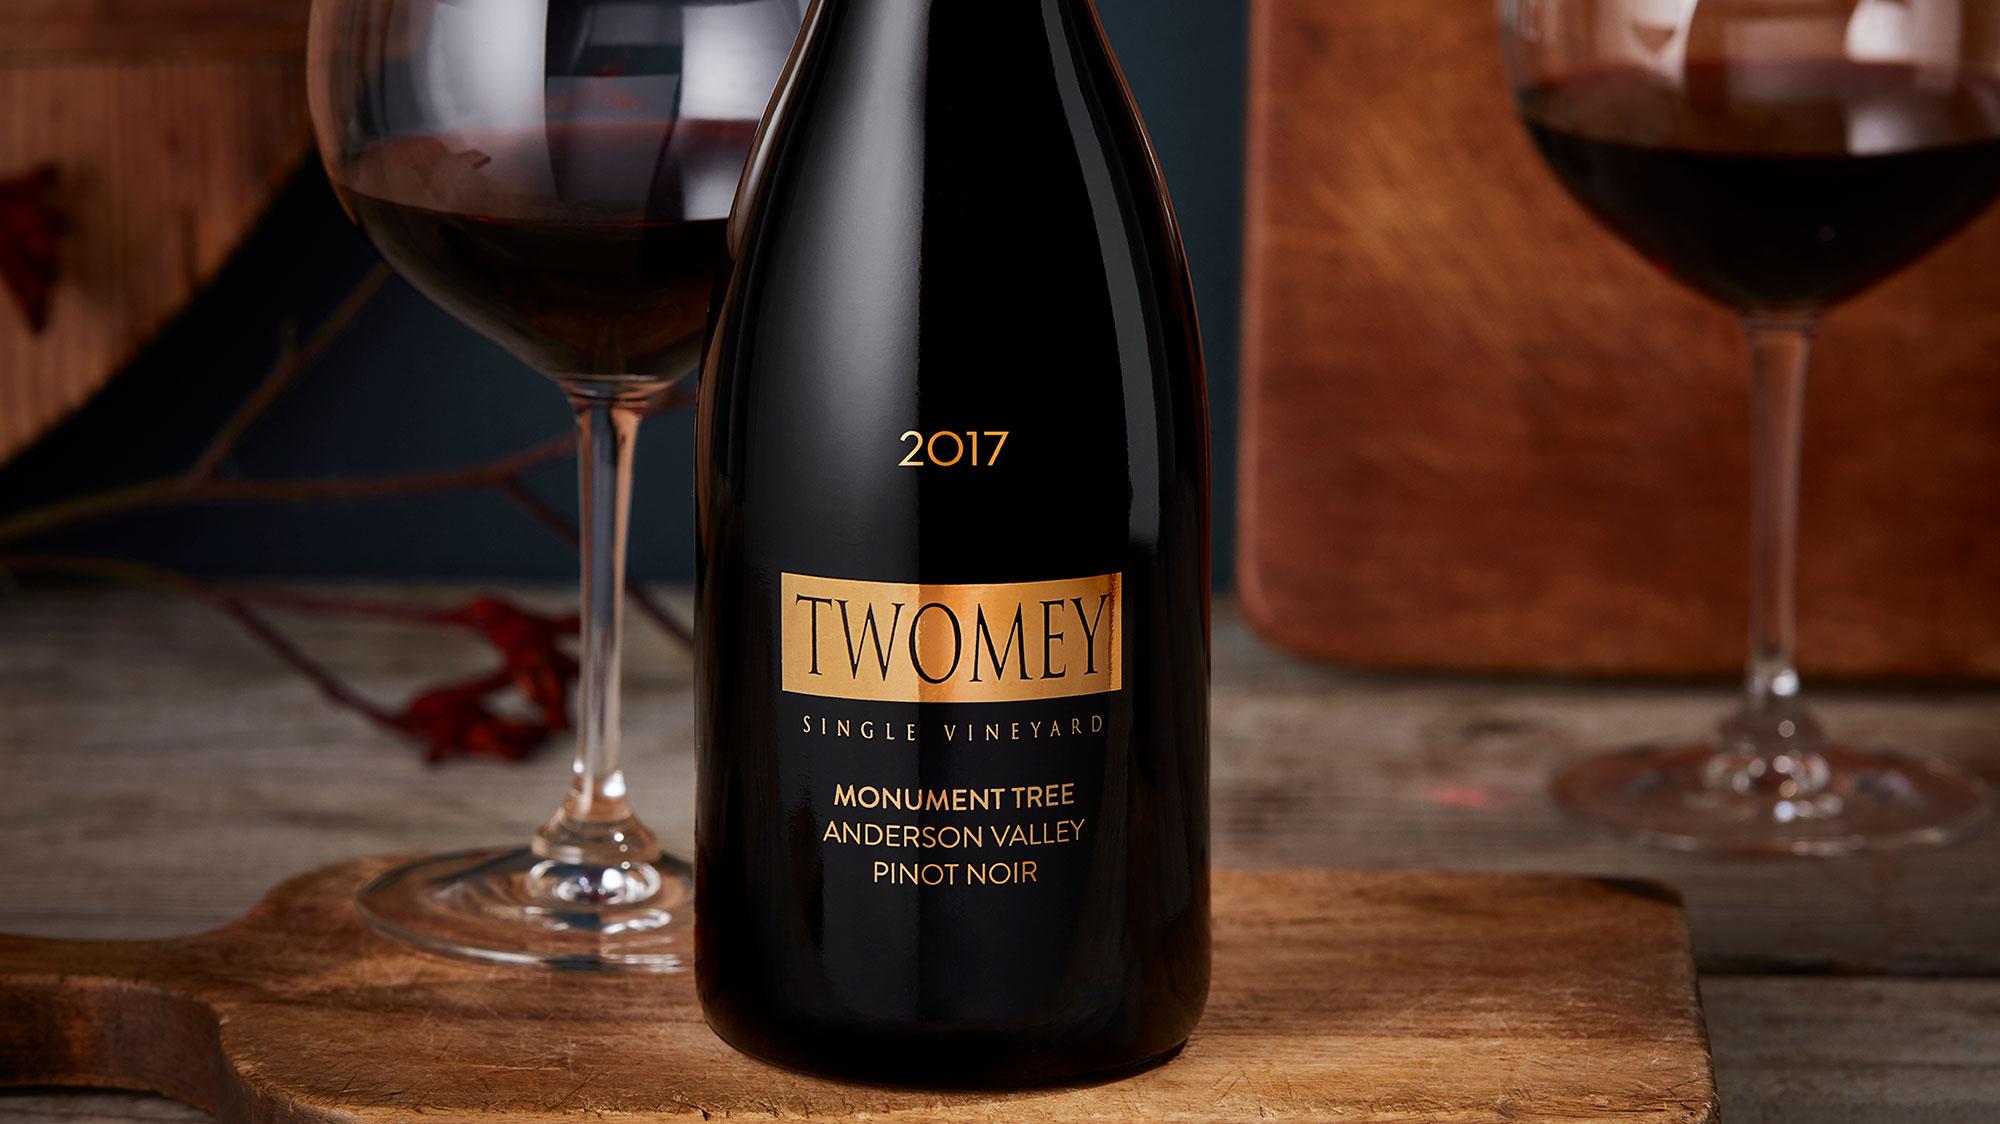 Twomey Monument Tree Pinot Noir bottle